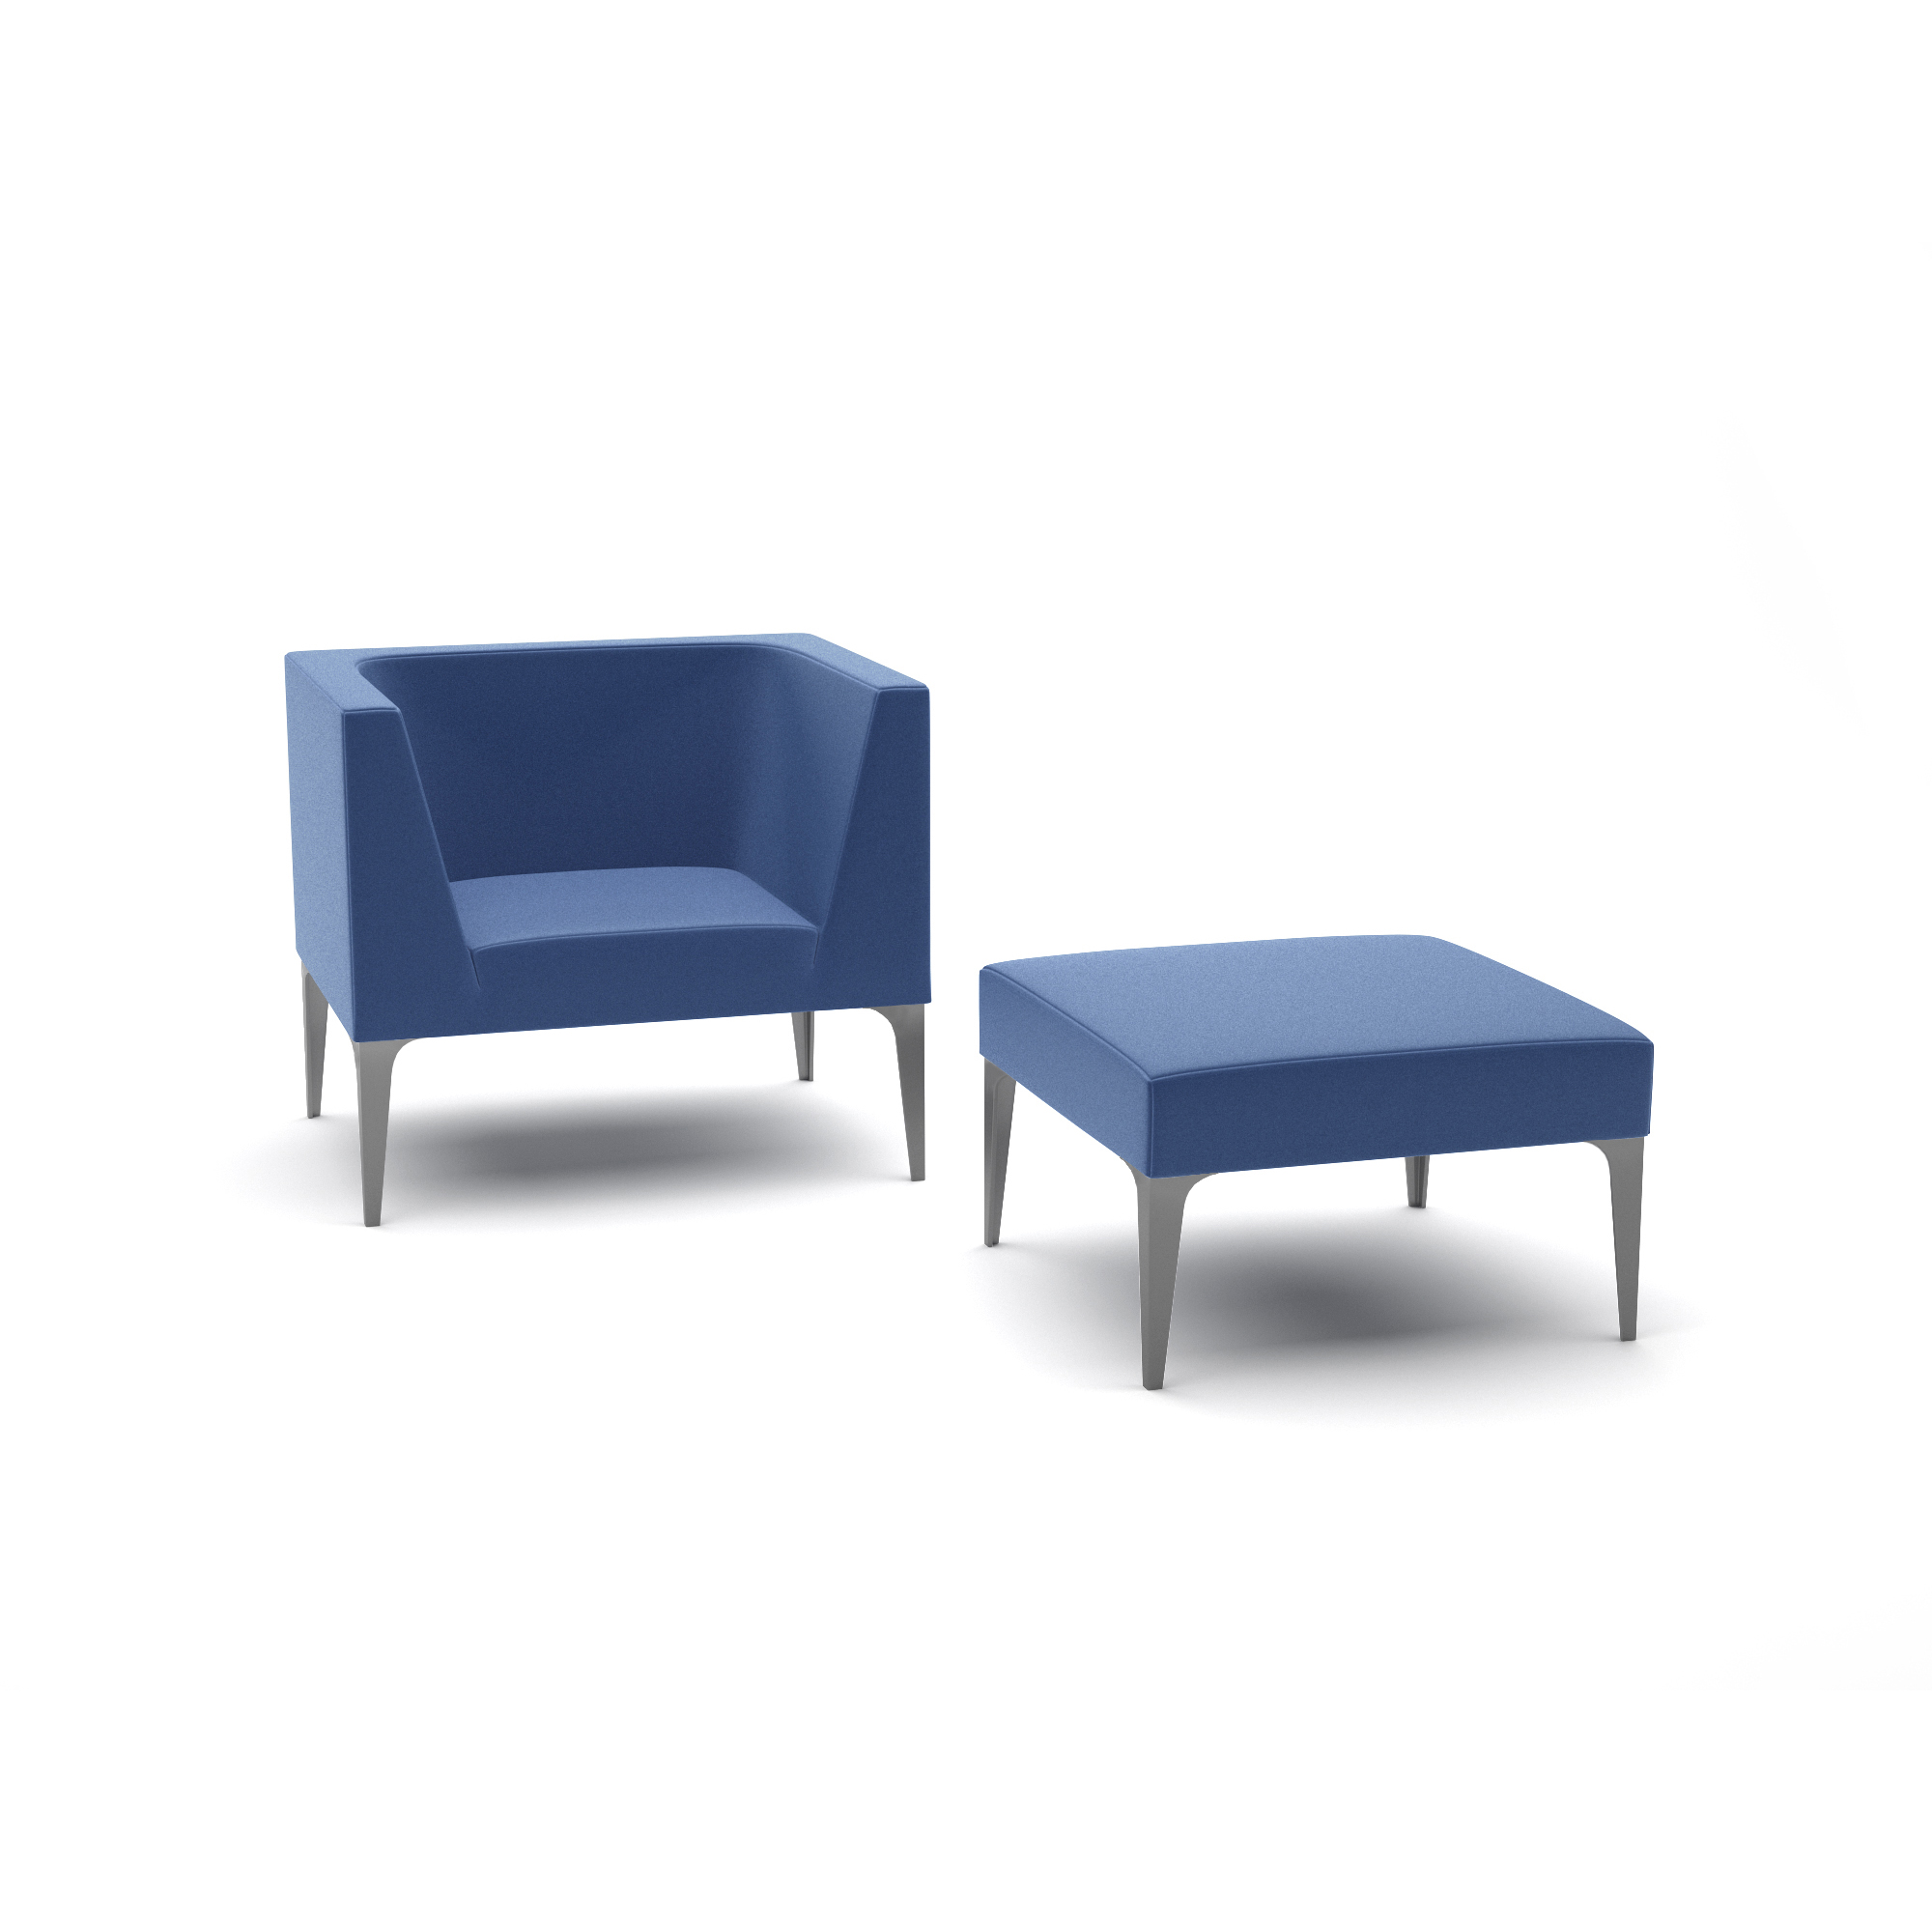 06S_Estel_Comfort&Relax_Sofa&Armchair_More-Club